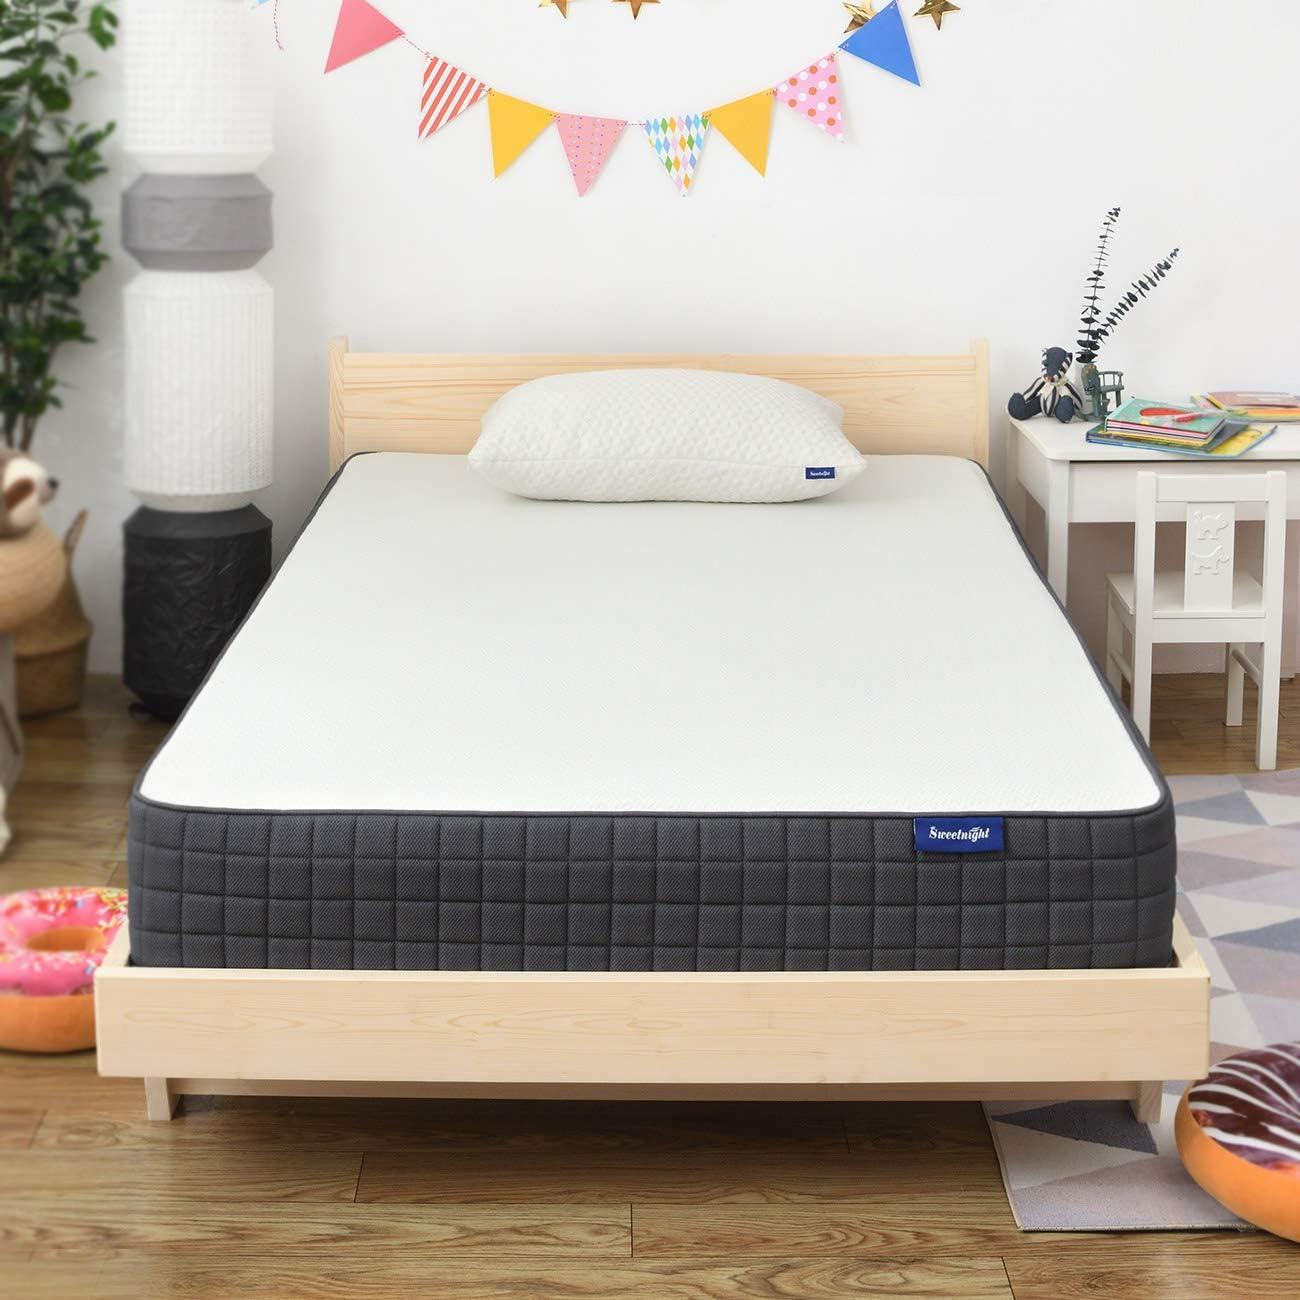 Amazon Com Twin Mattress Sweetnight Breeze Twin Size Mattress Medium Firm Memory Foam Mattress For Sleep Cool Pressure Relief 8 Inch Furniture Decor